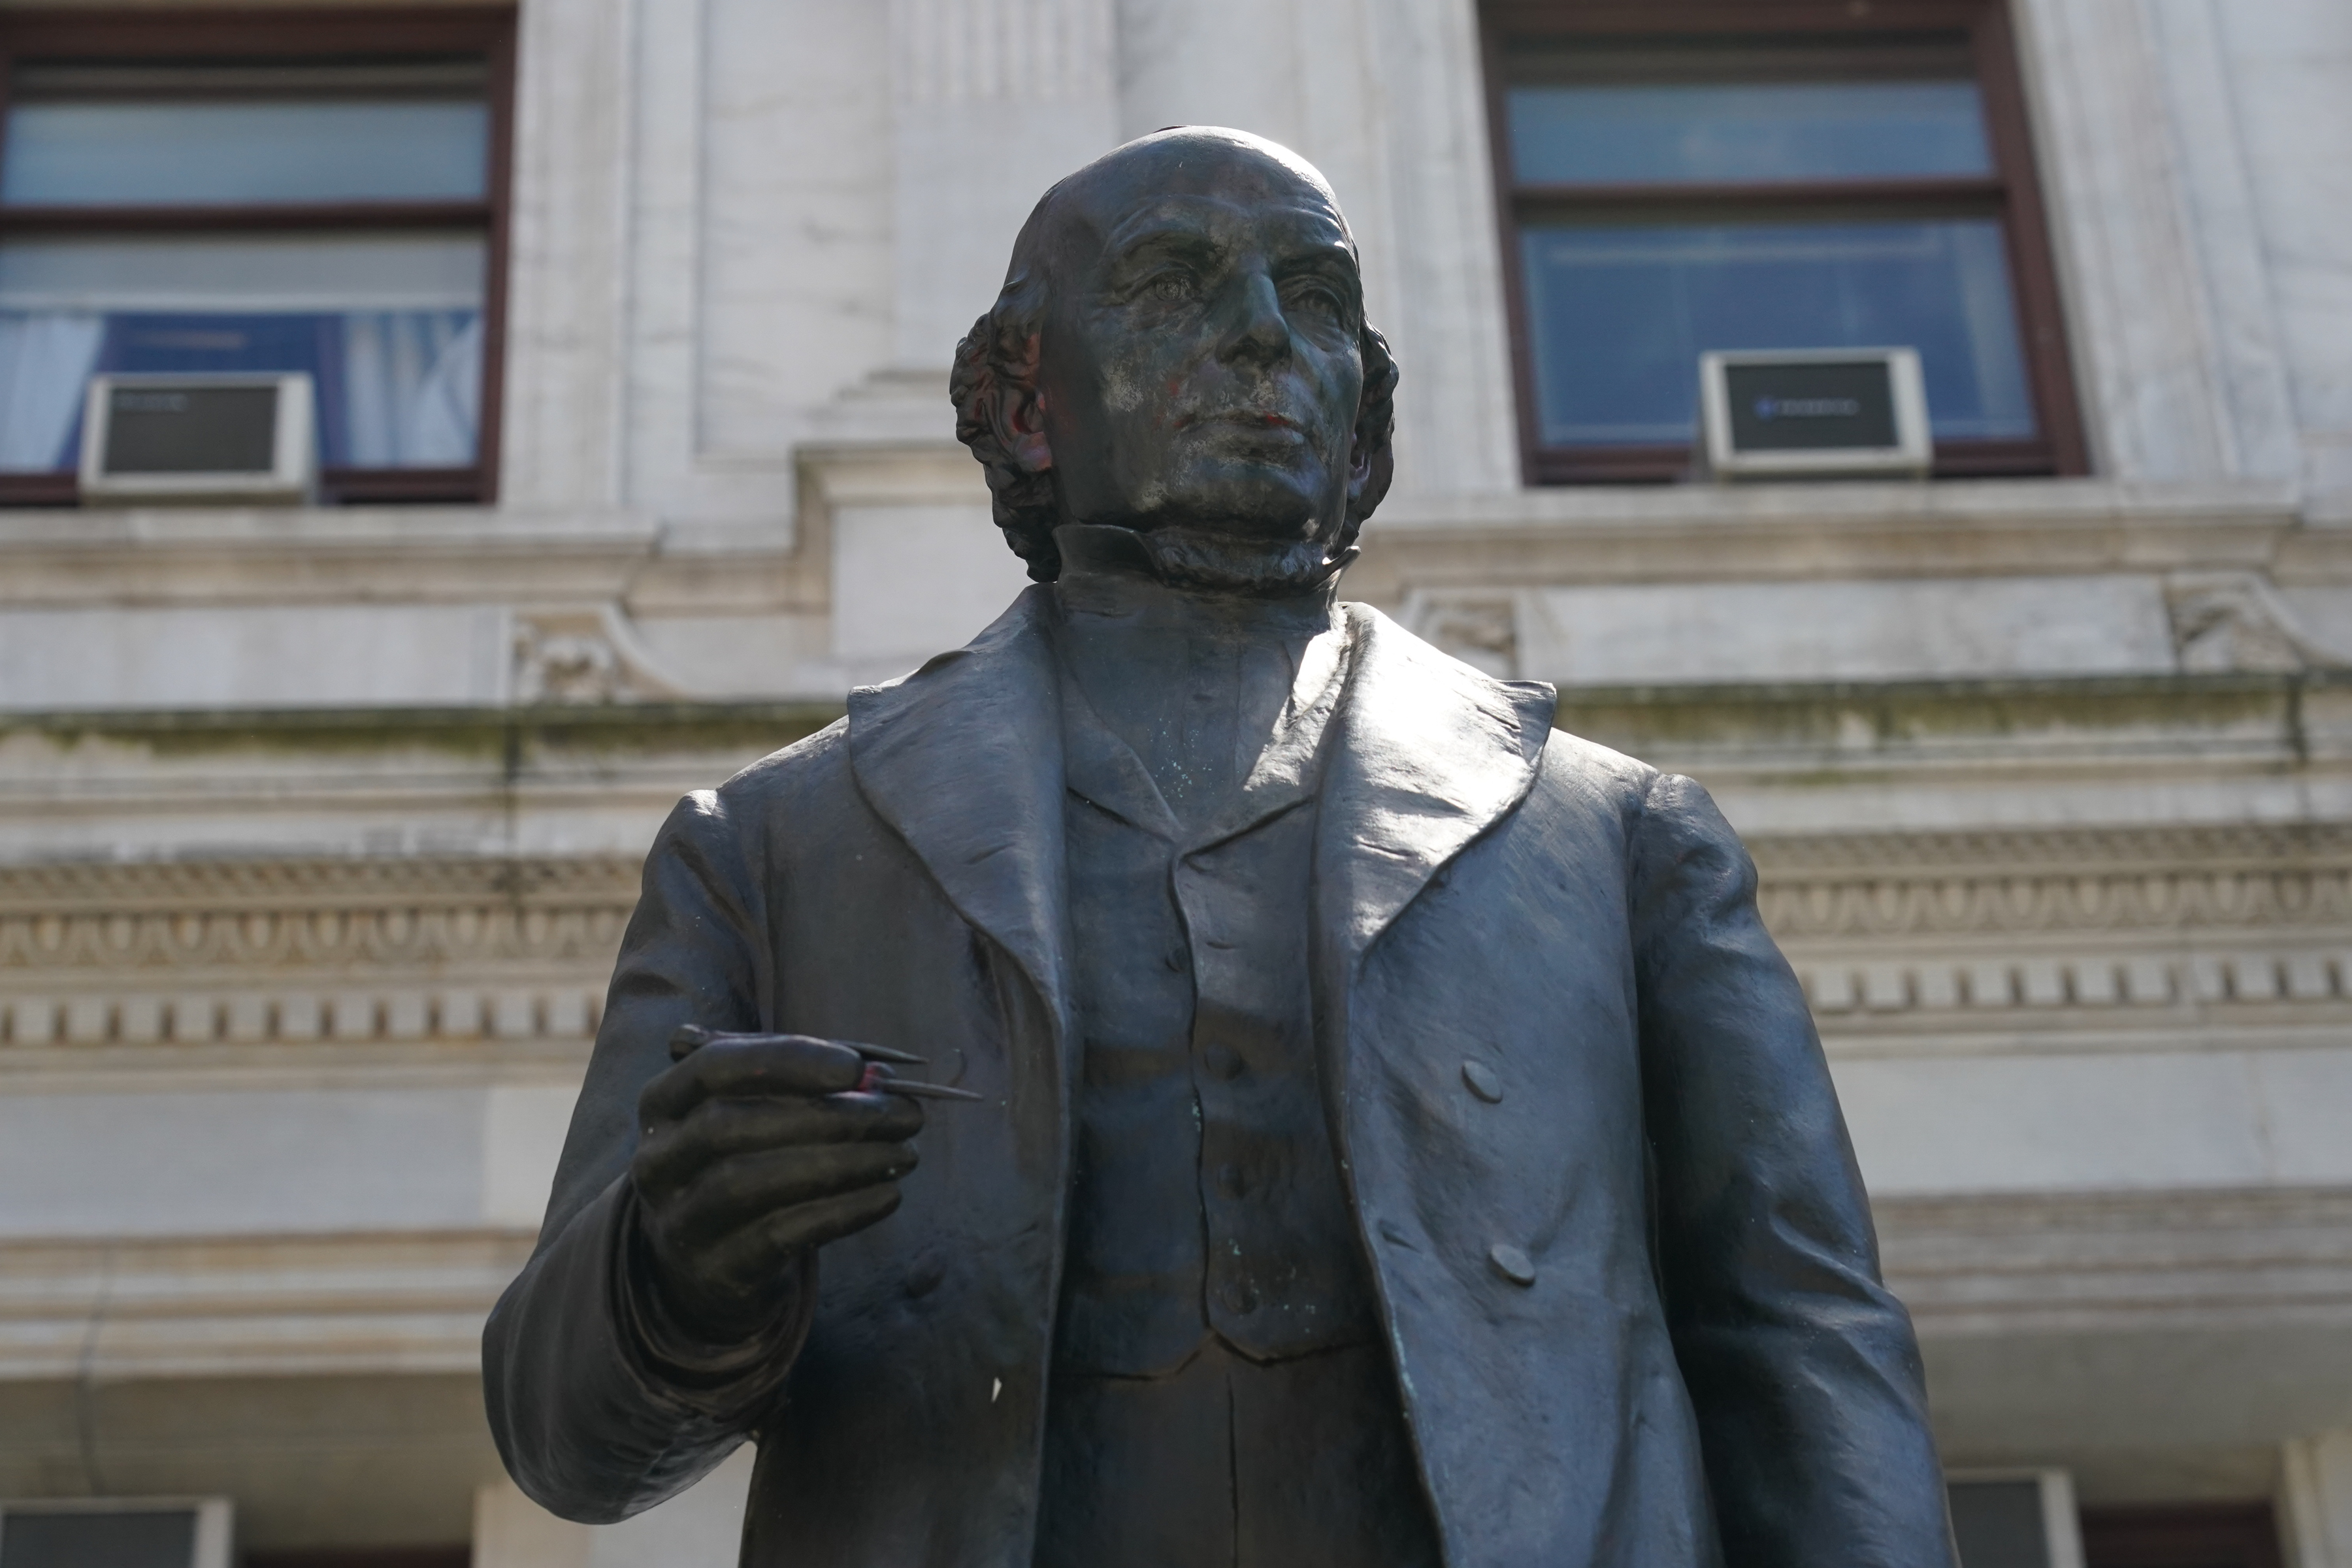 Statue of Philadelphia Abolitionist Matthias Baldwin